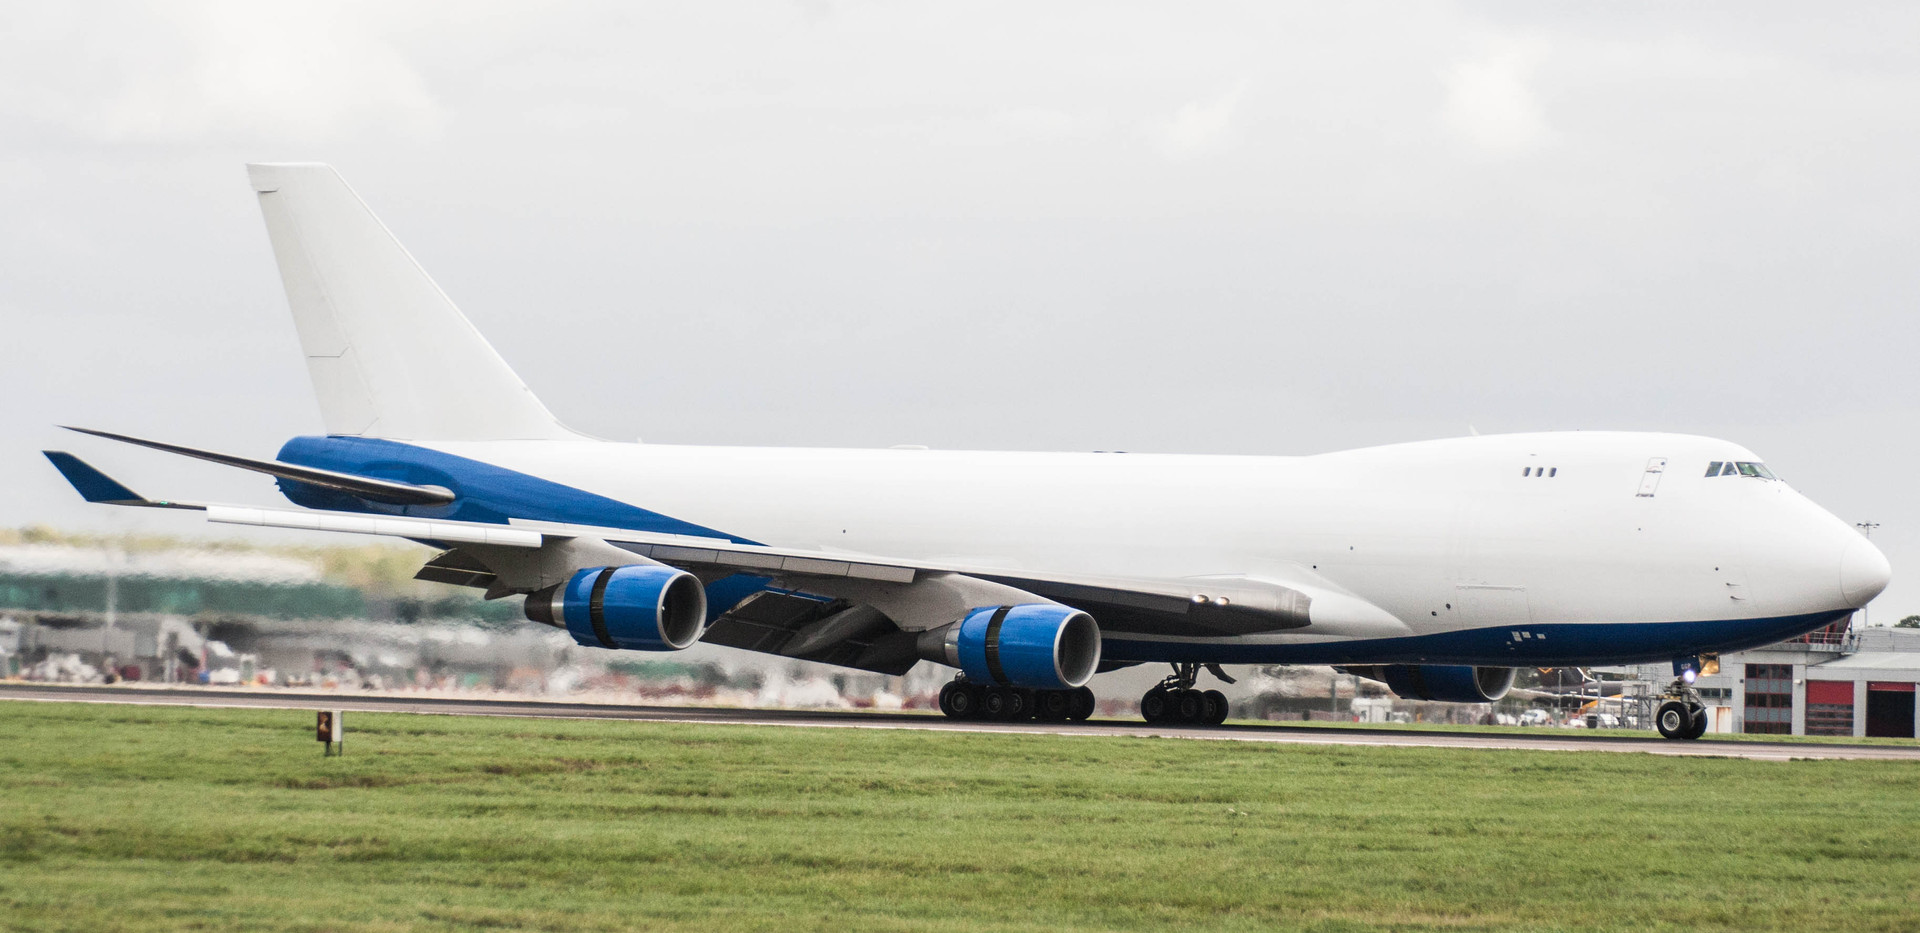 Boeing 747 - MSN 28032 - A6-GGP  (1 of 1